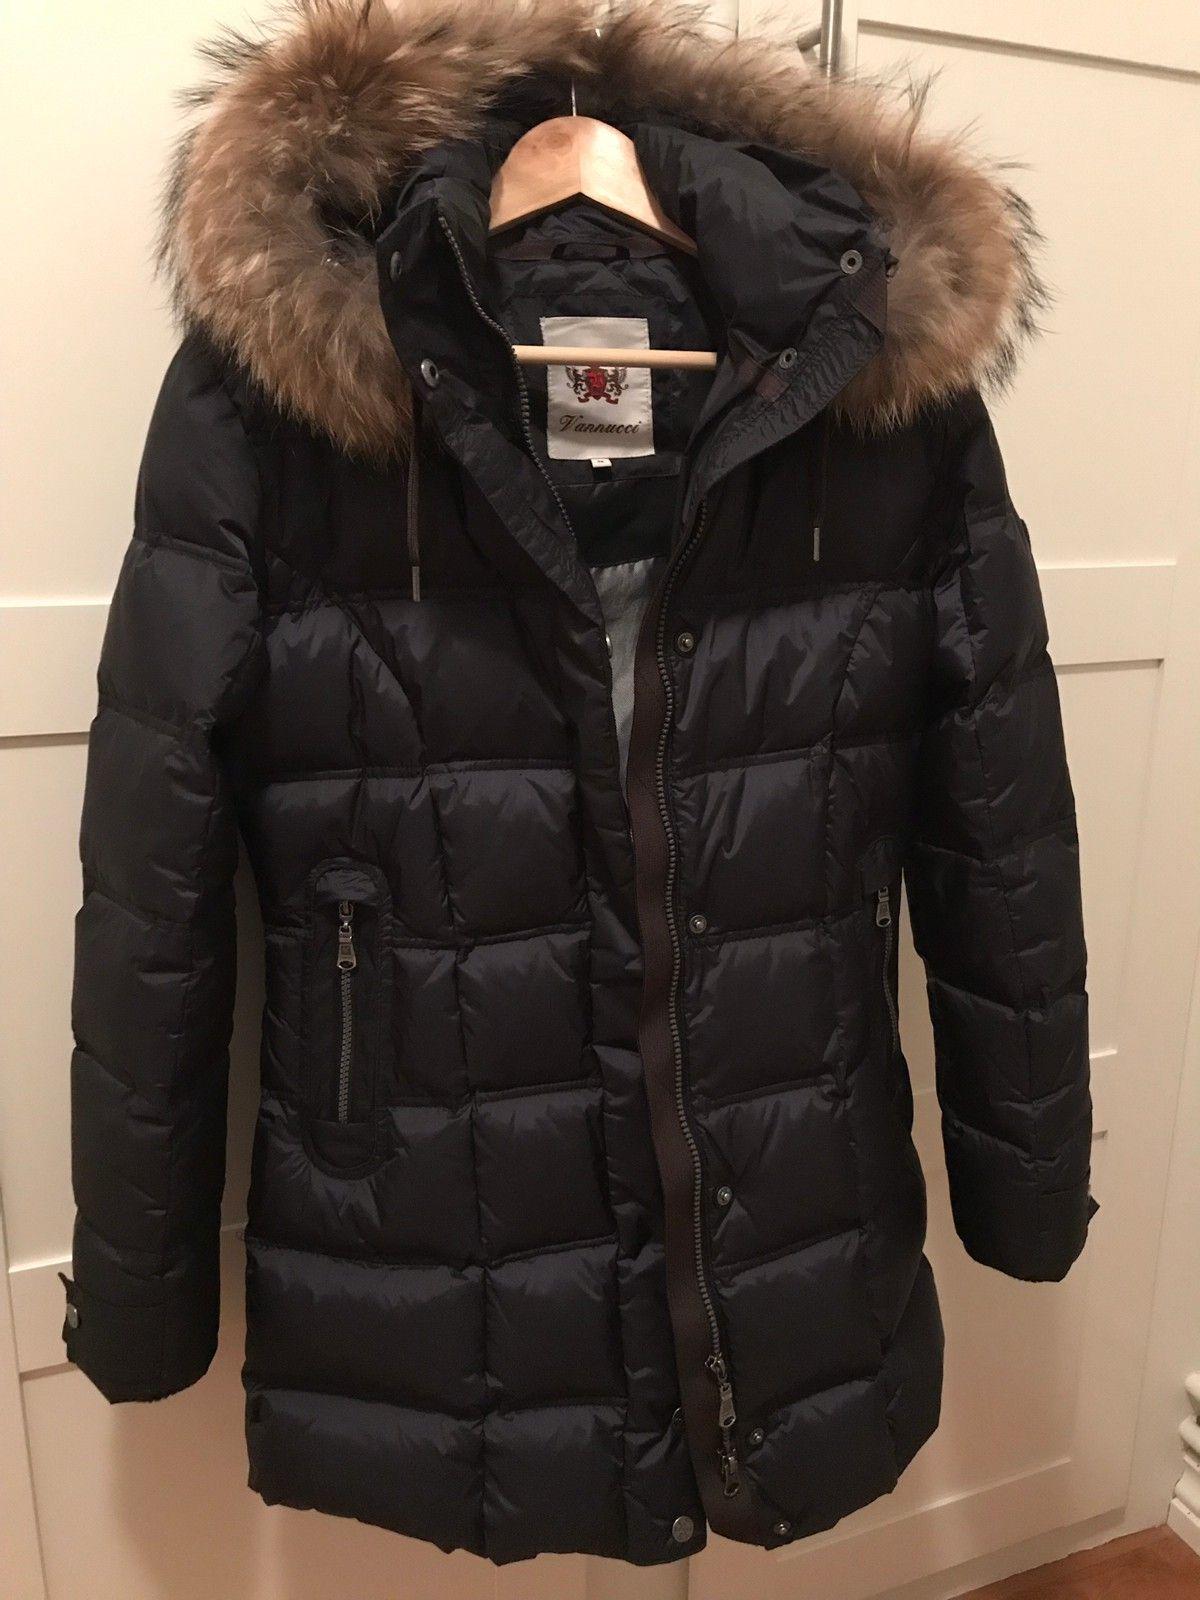 Vannucci jakke med ekte pels | FINN.no